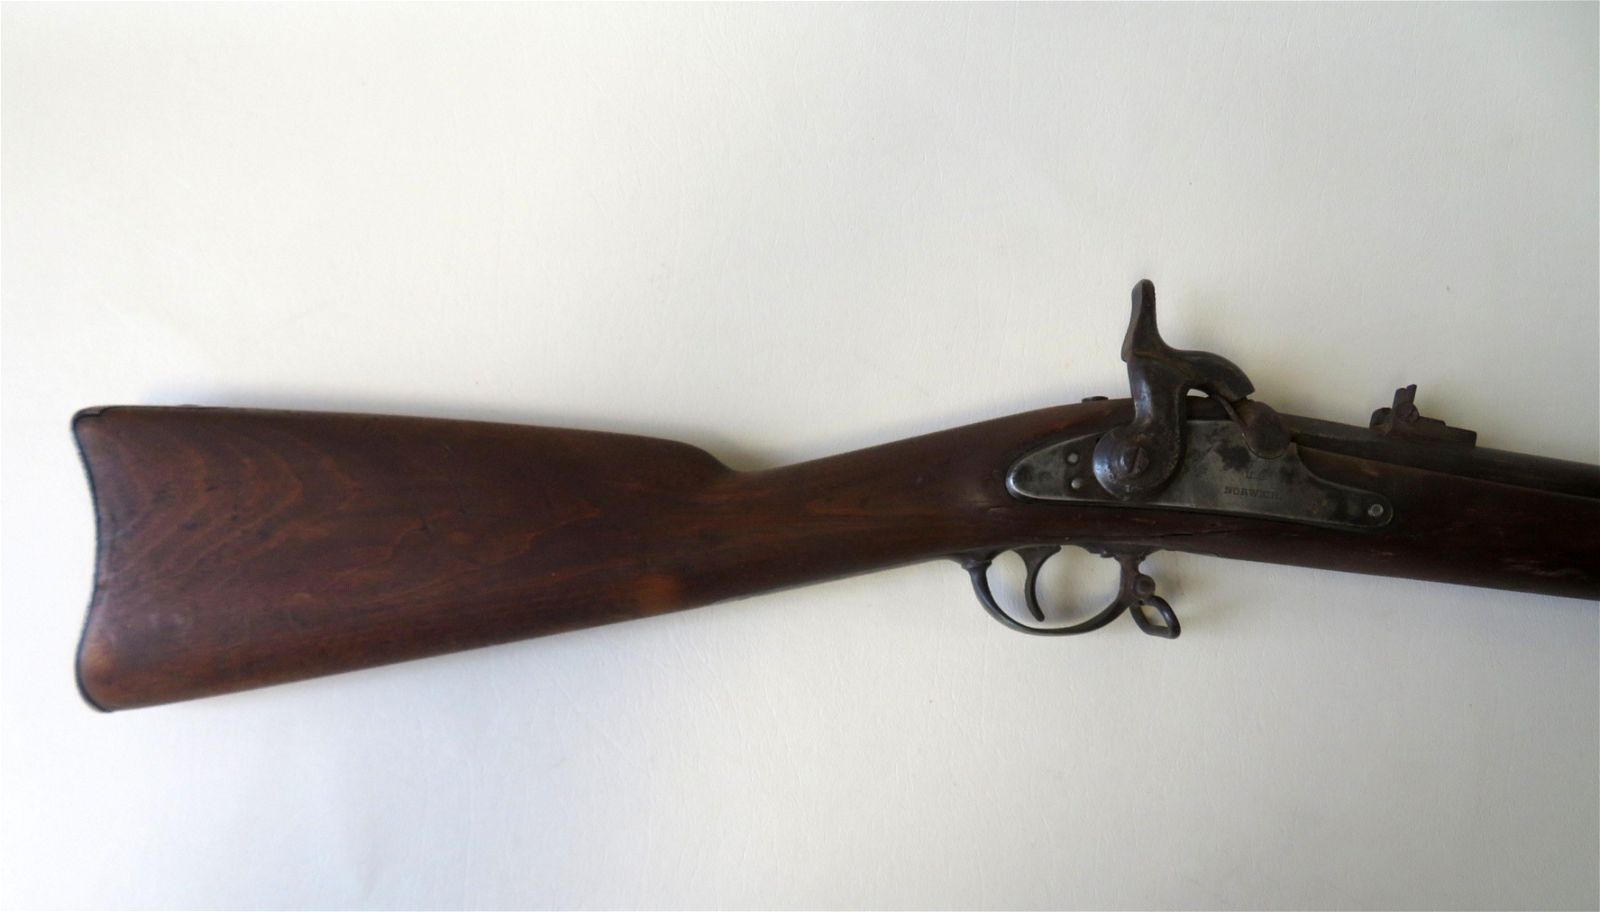 U.S. Norwich Civil War percussion musket, model 1863 as